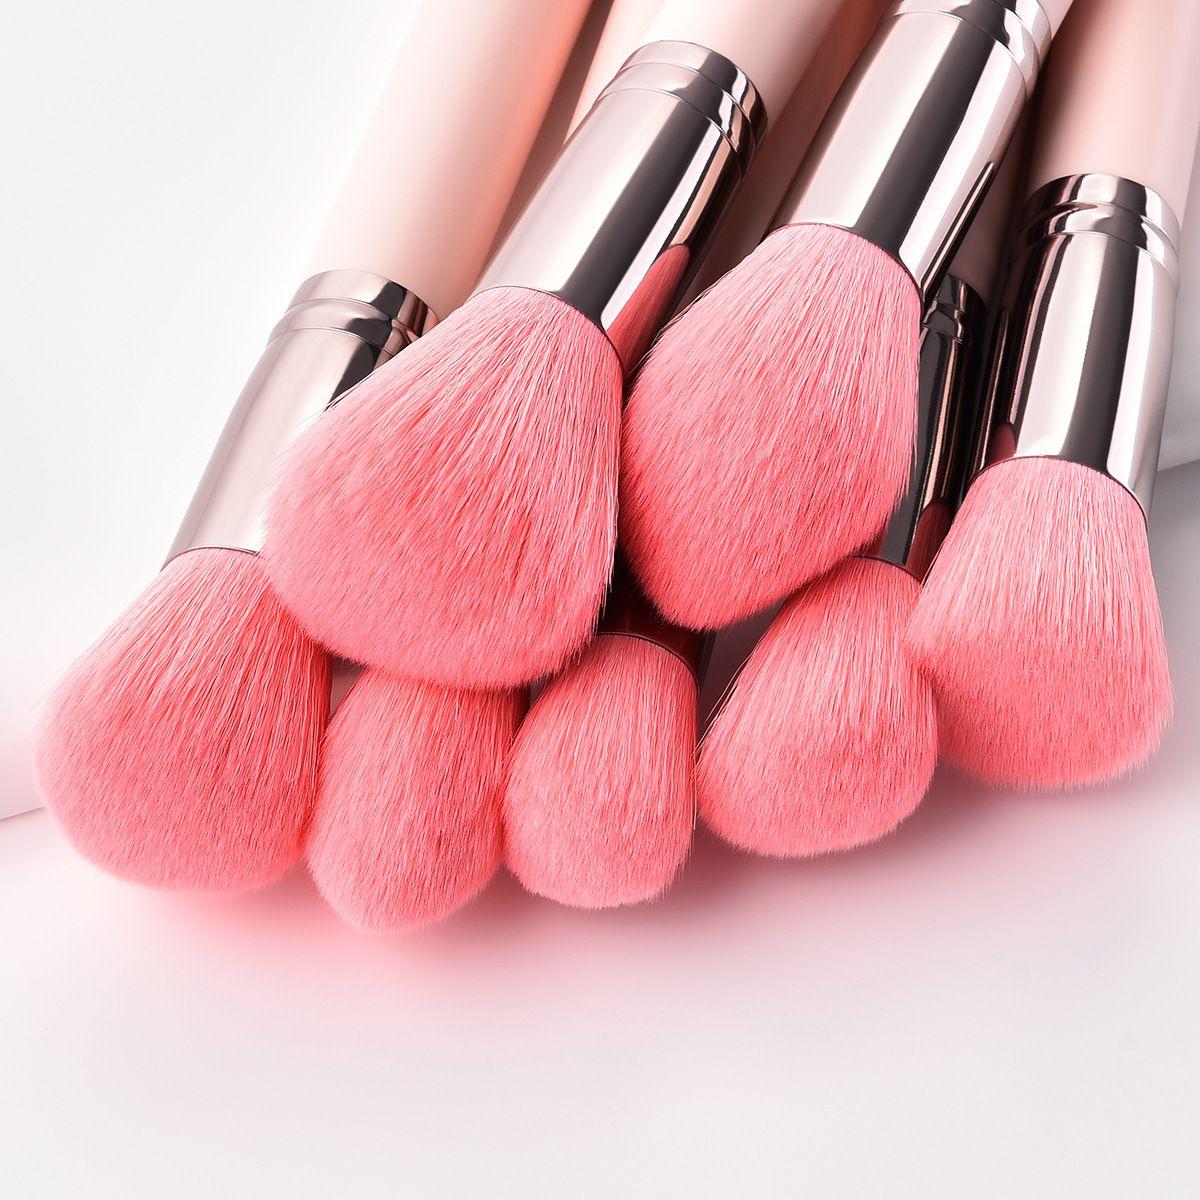 soft hair pink makeup brushes kit wholesaleinquiry